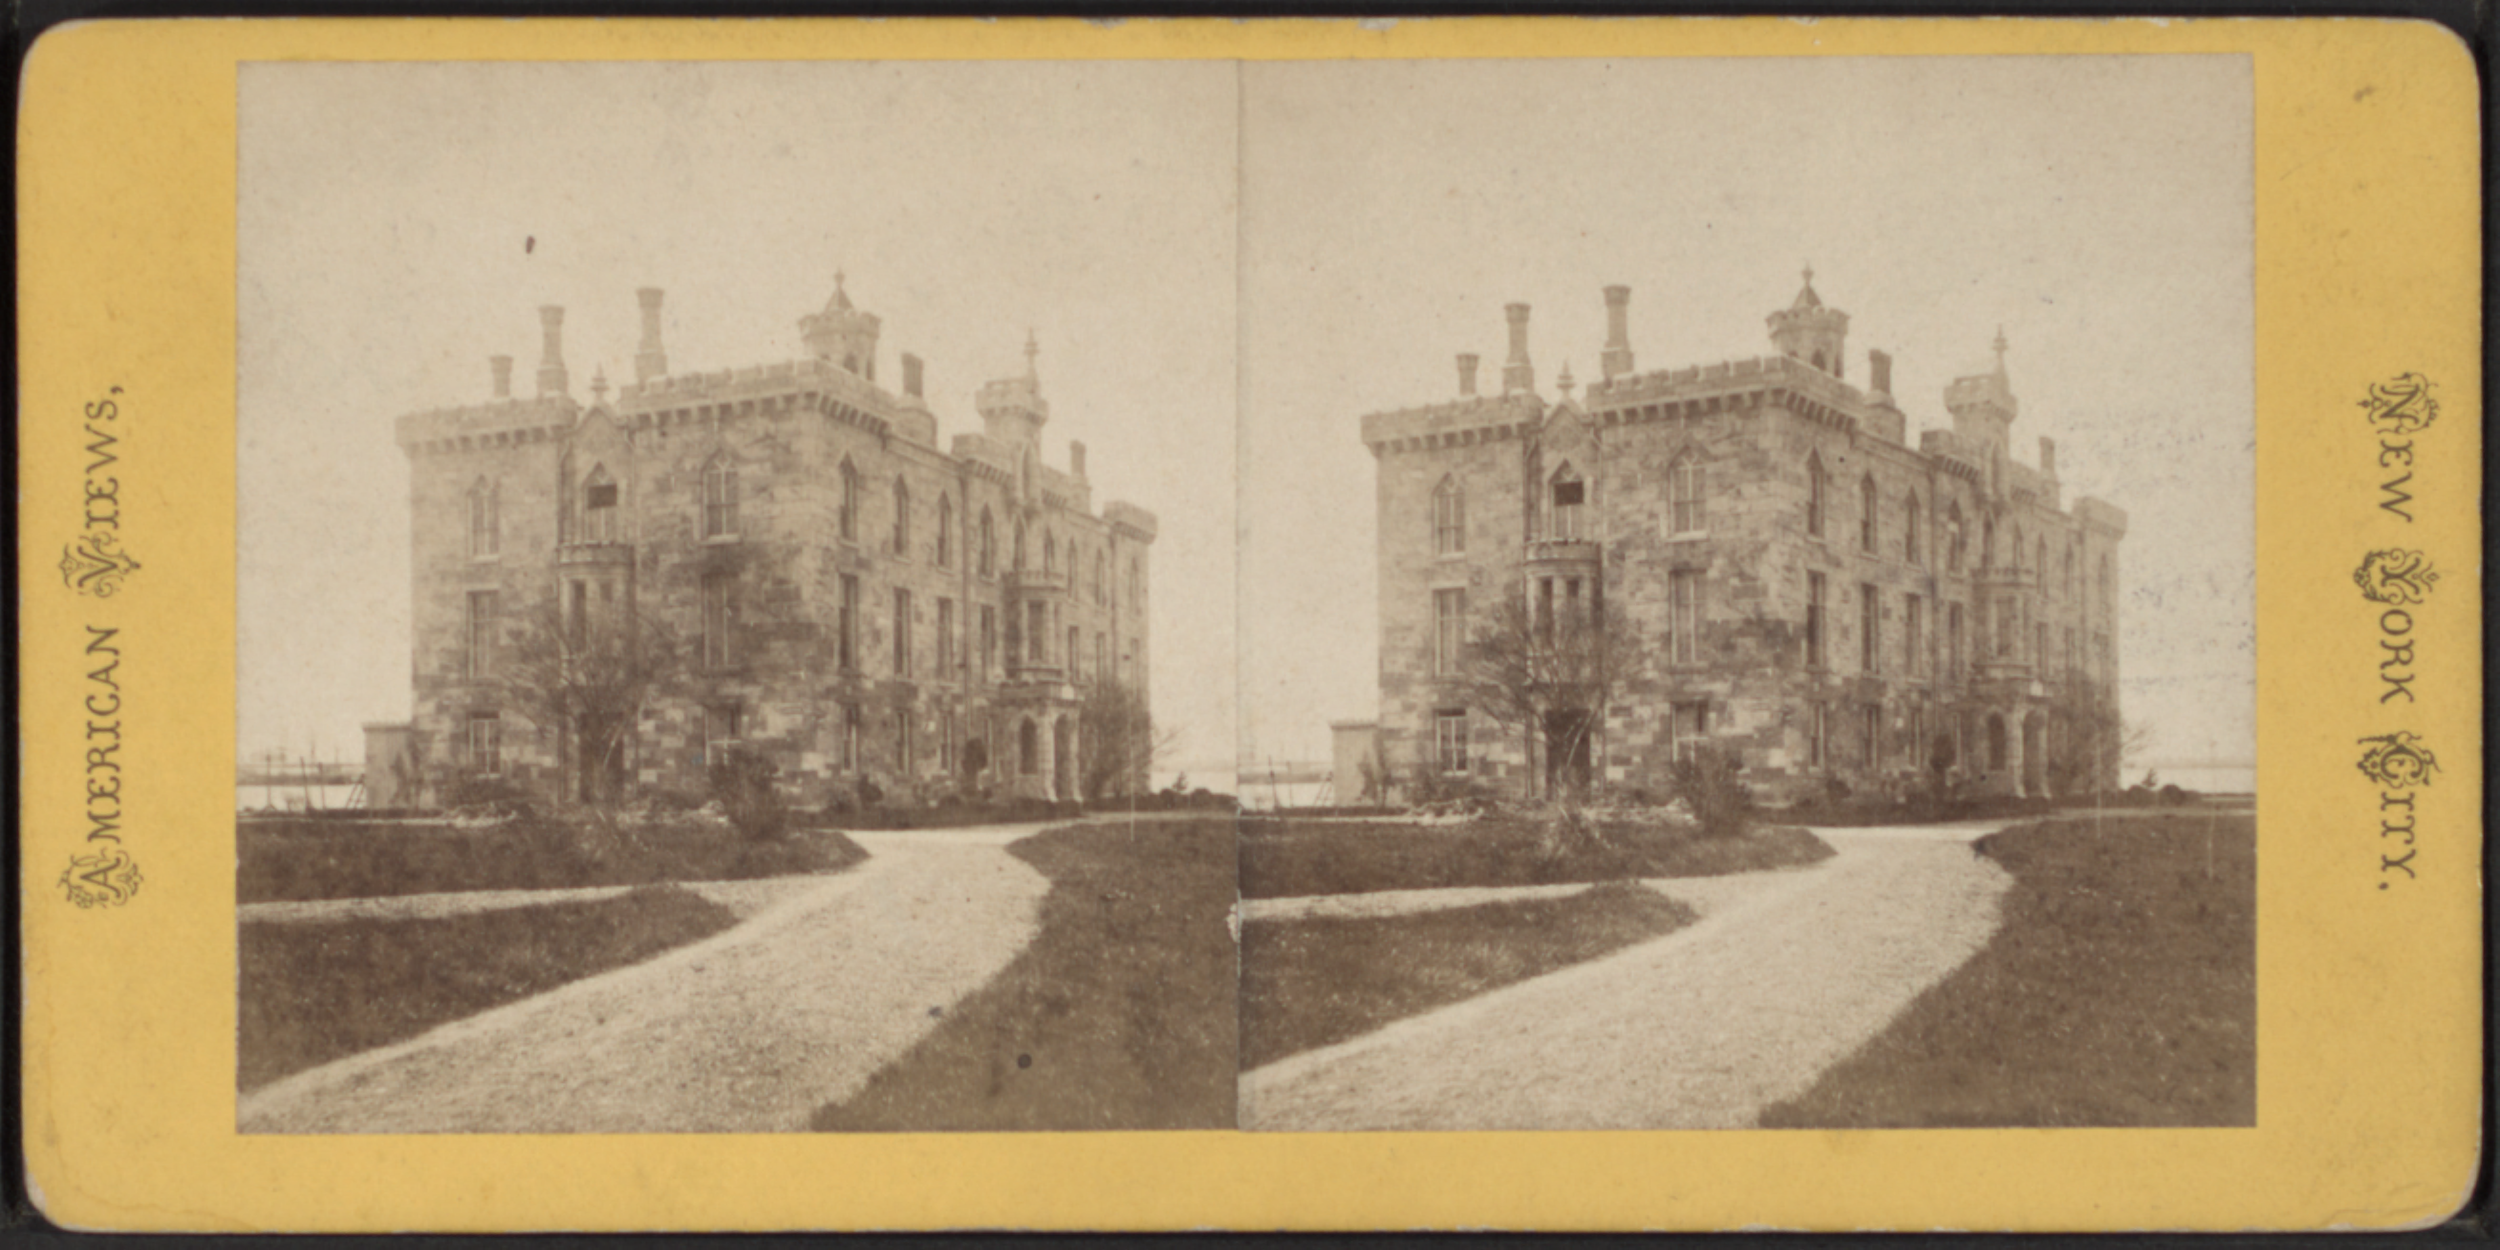 Stereoscopic photograph of the original Smallpox Hospital building